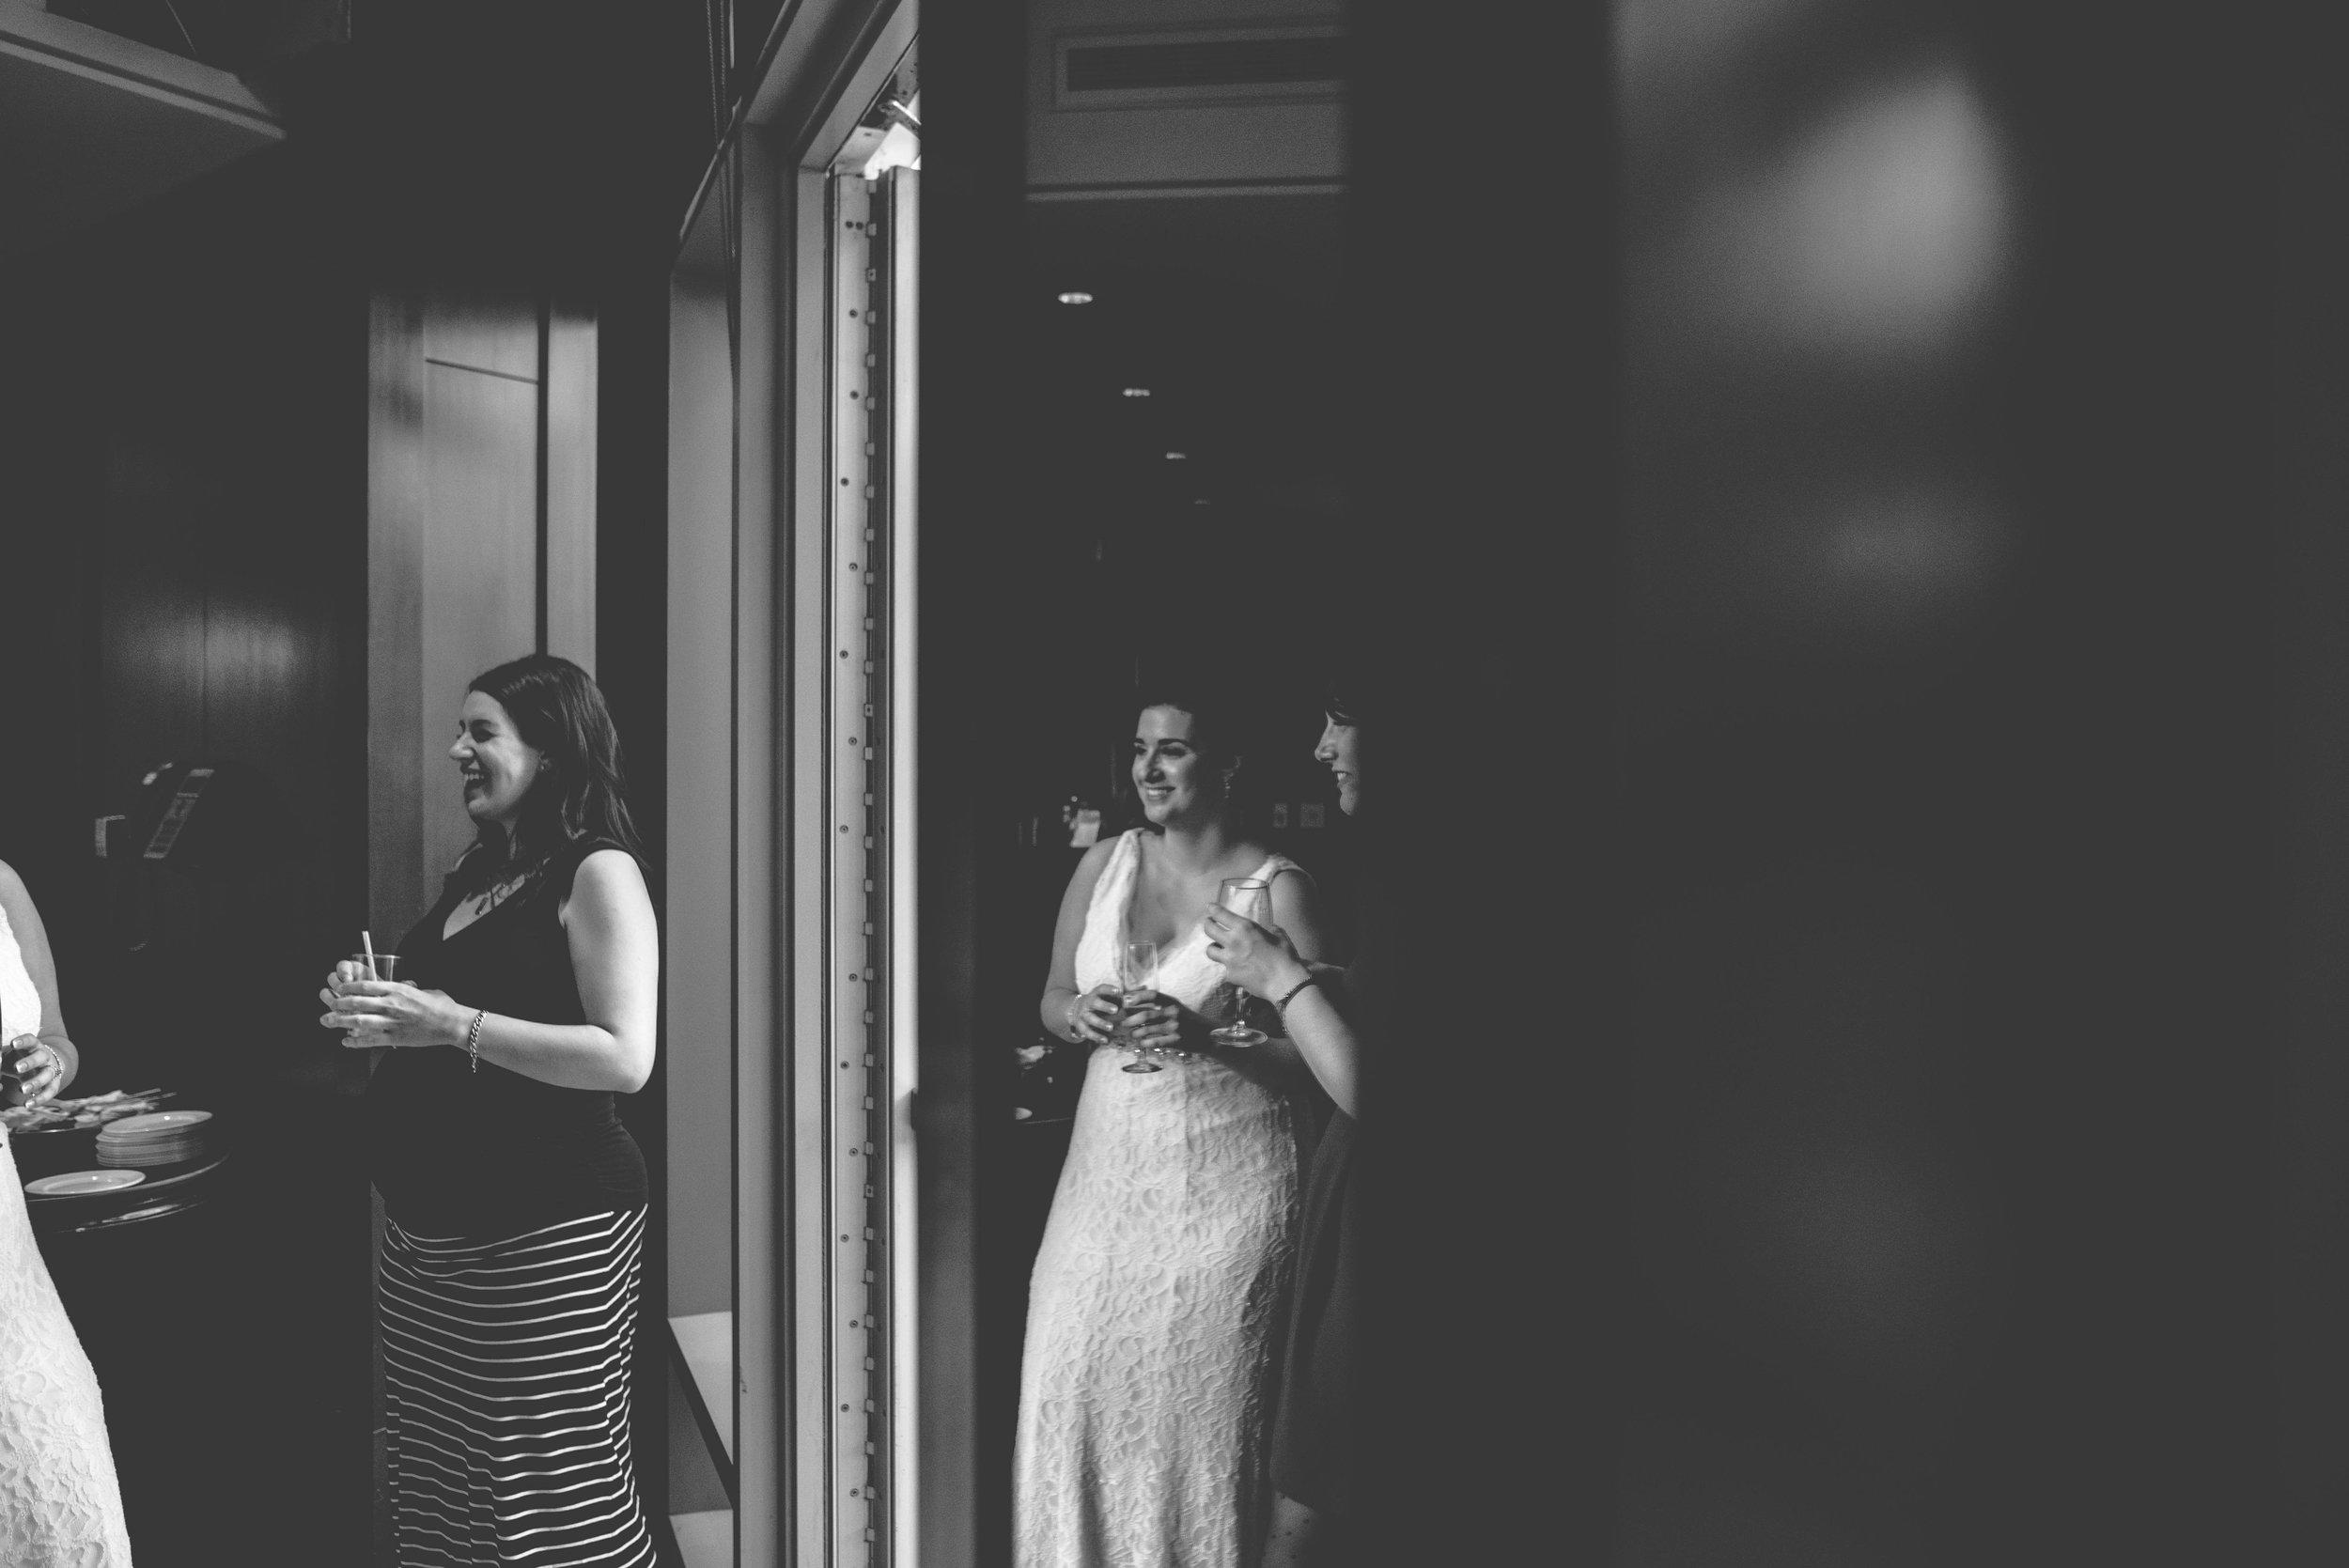 photographe_mariage_gatineau_hull_outaouais_photographer_ottawa_wedding_hilton-35.jpg